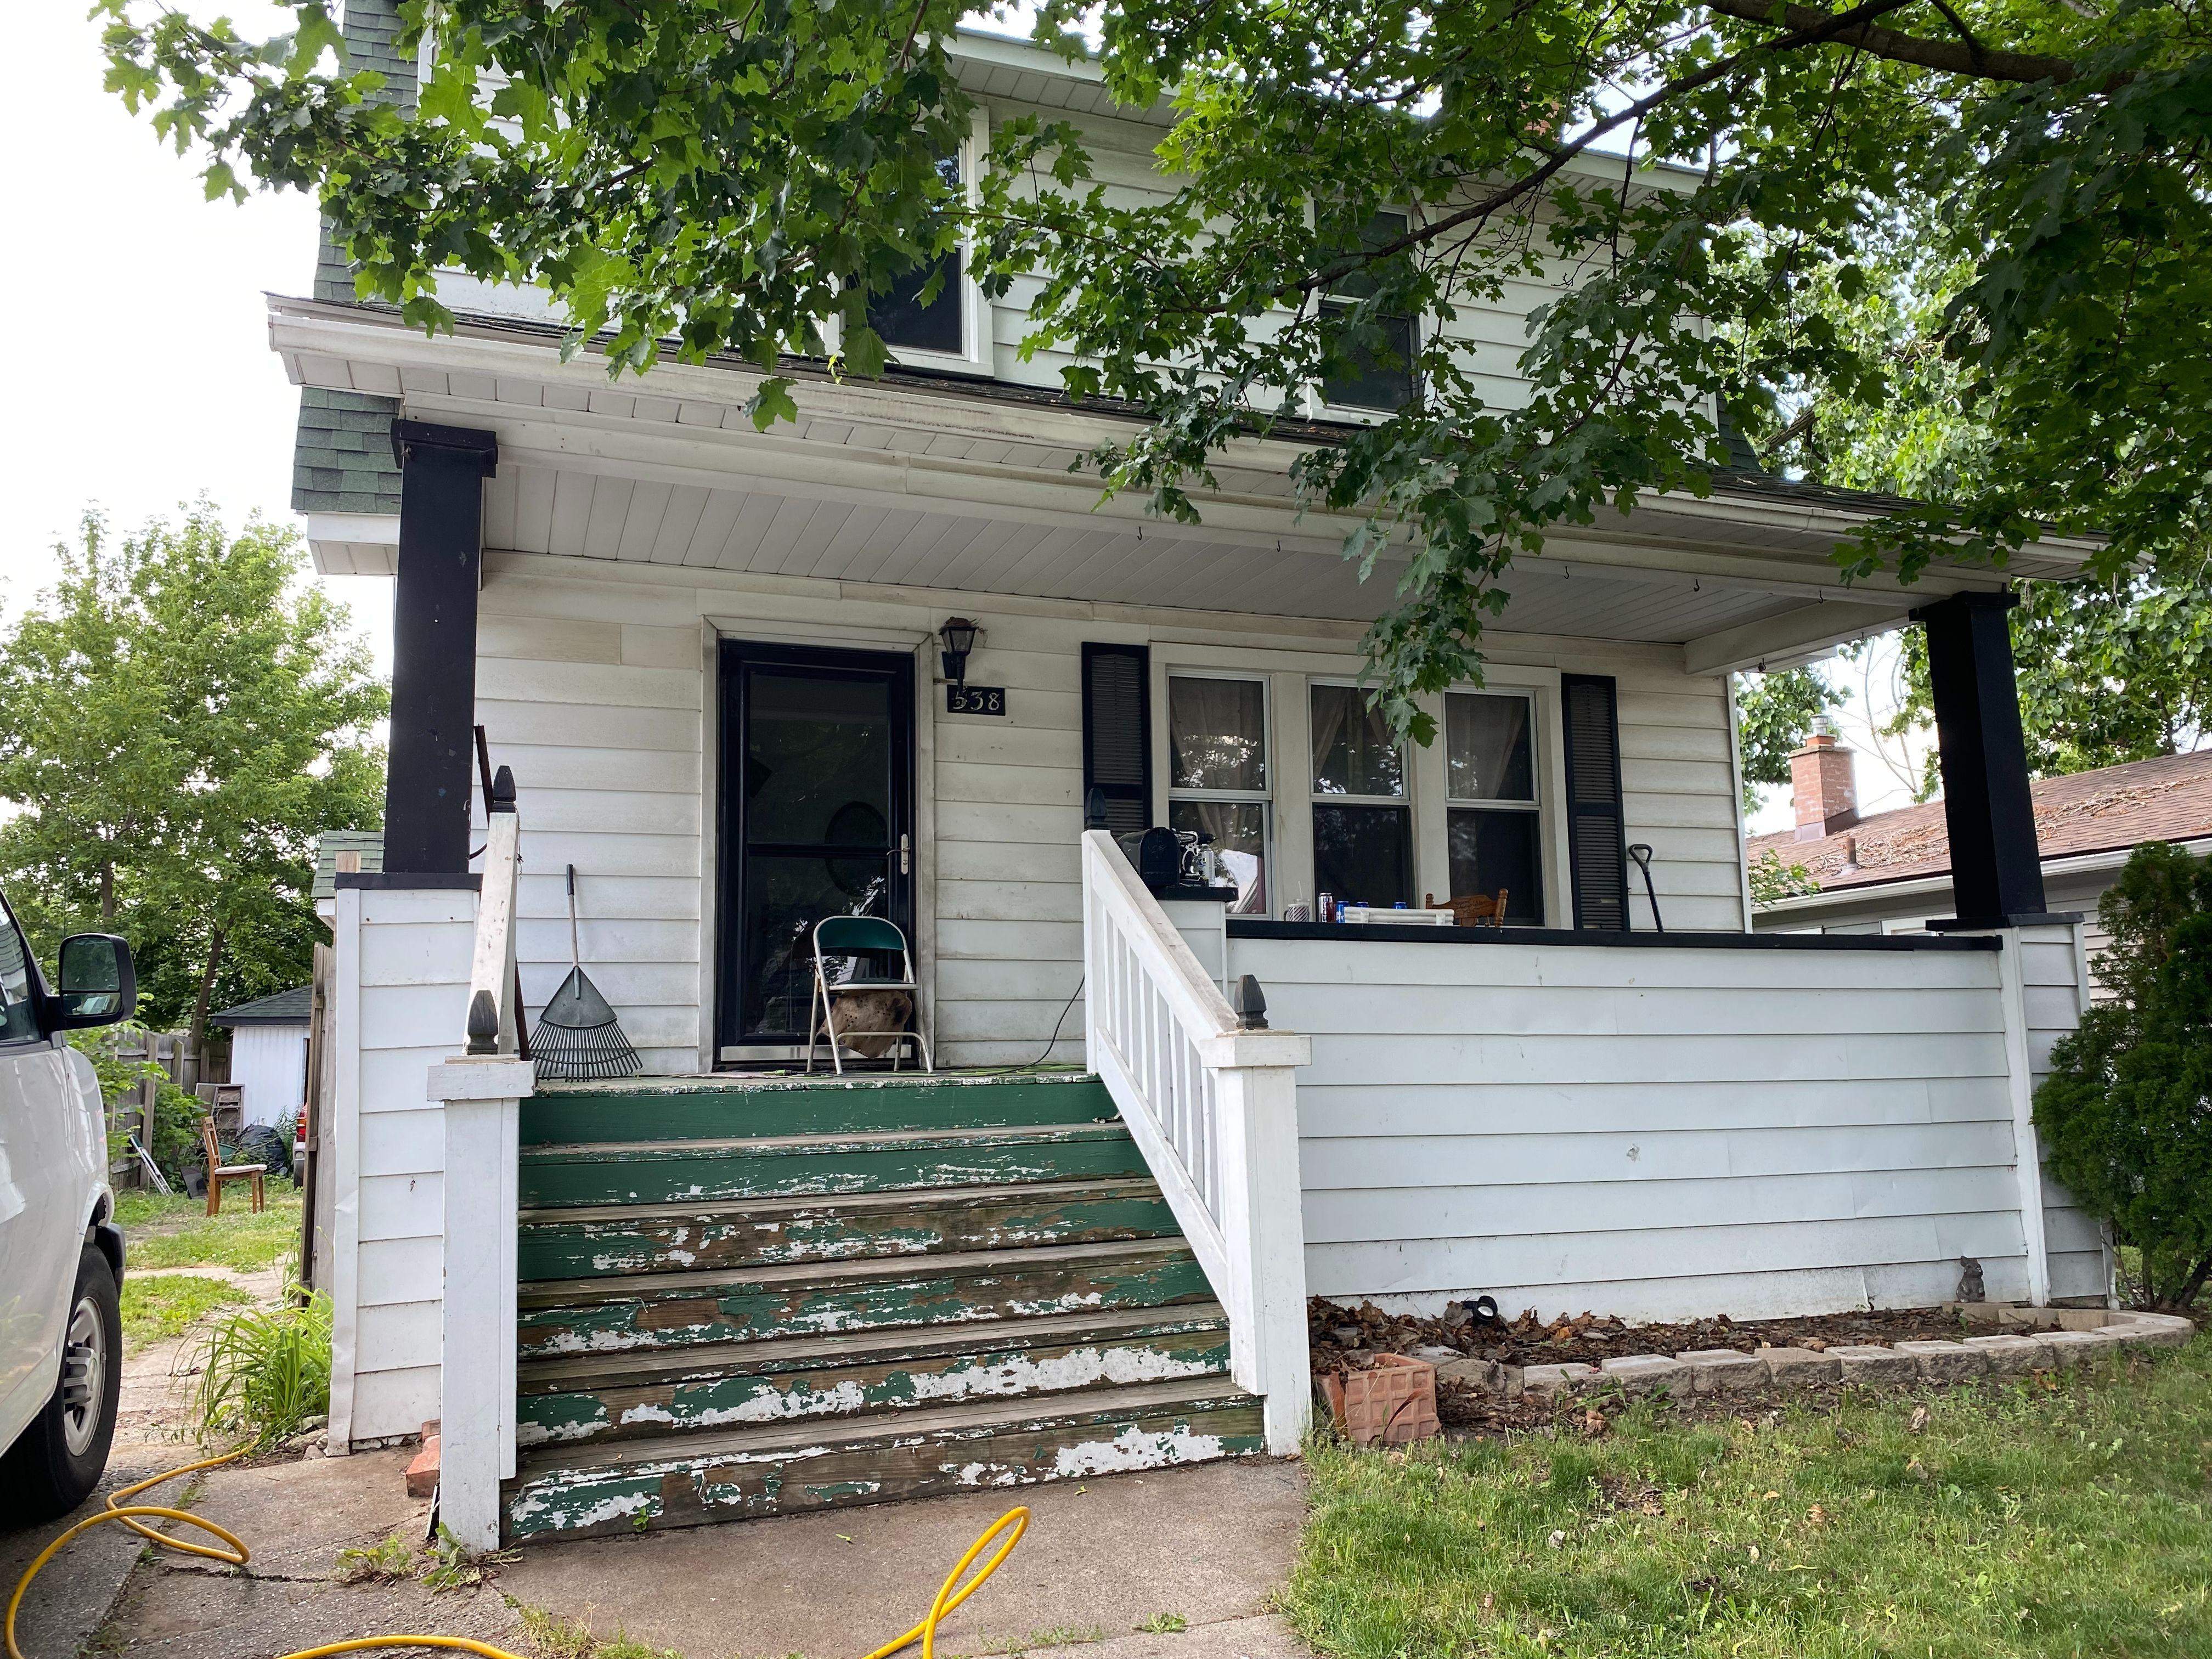 538 E Woodruff Ave, Hazel Park, MI